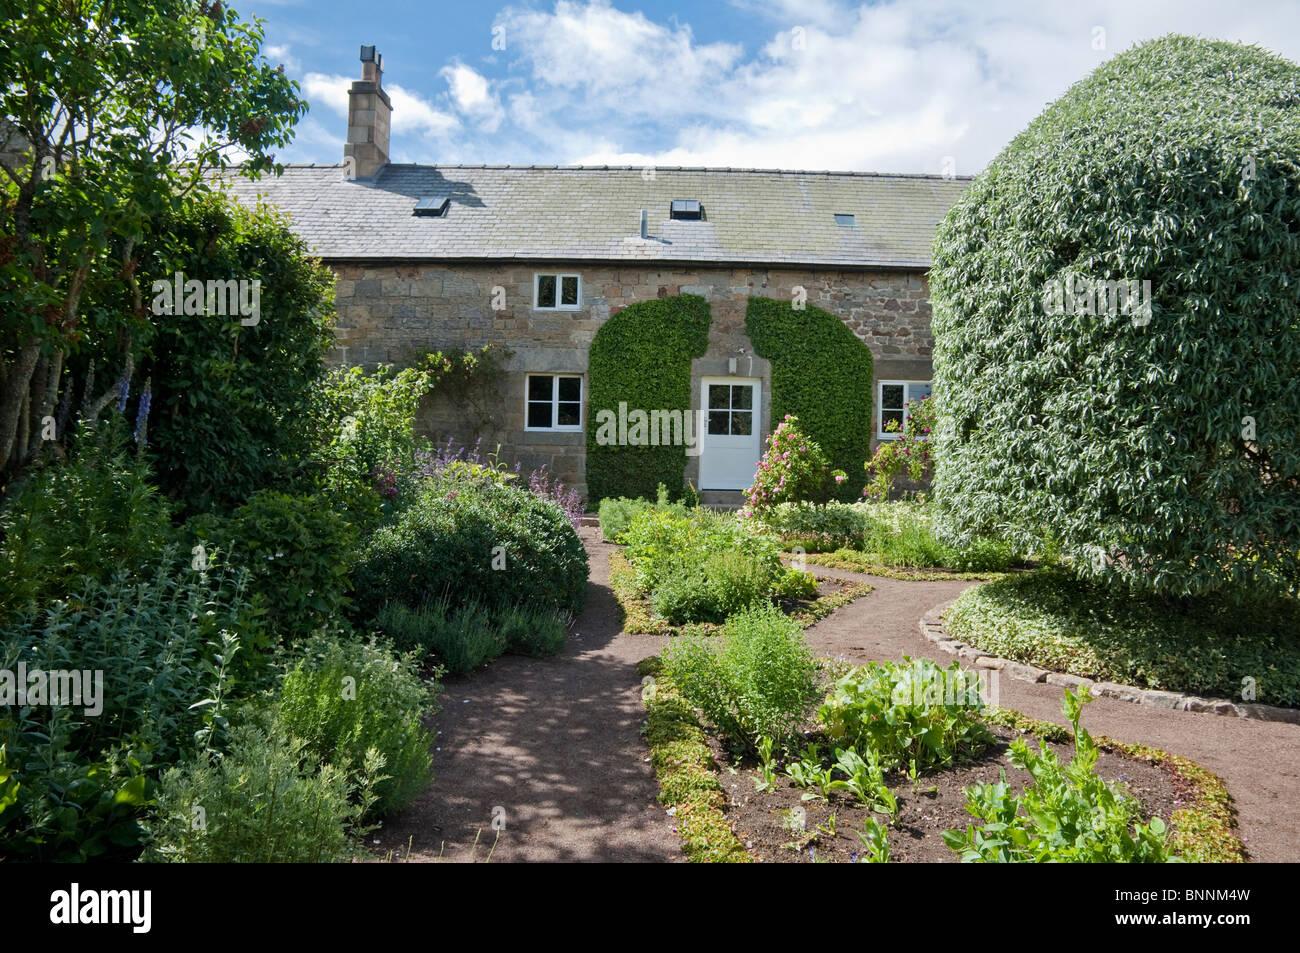 Herterton House Garden, Nr Cambo, Northumberland, UK - The Physic Garden - Stock Image